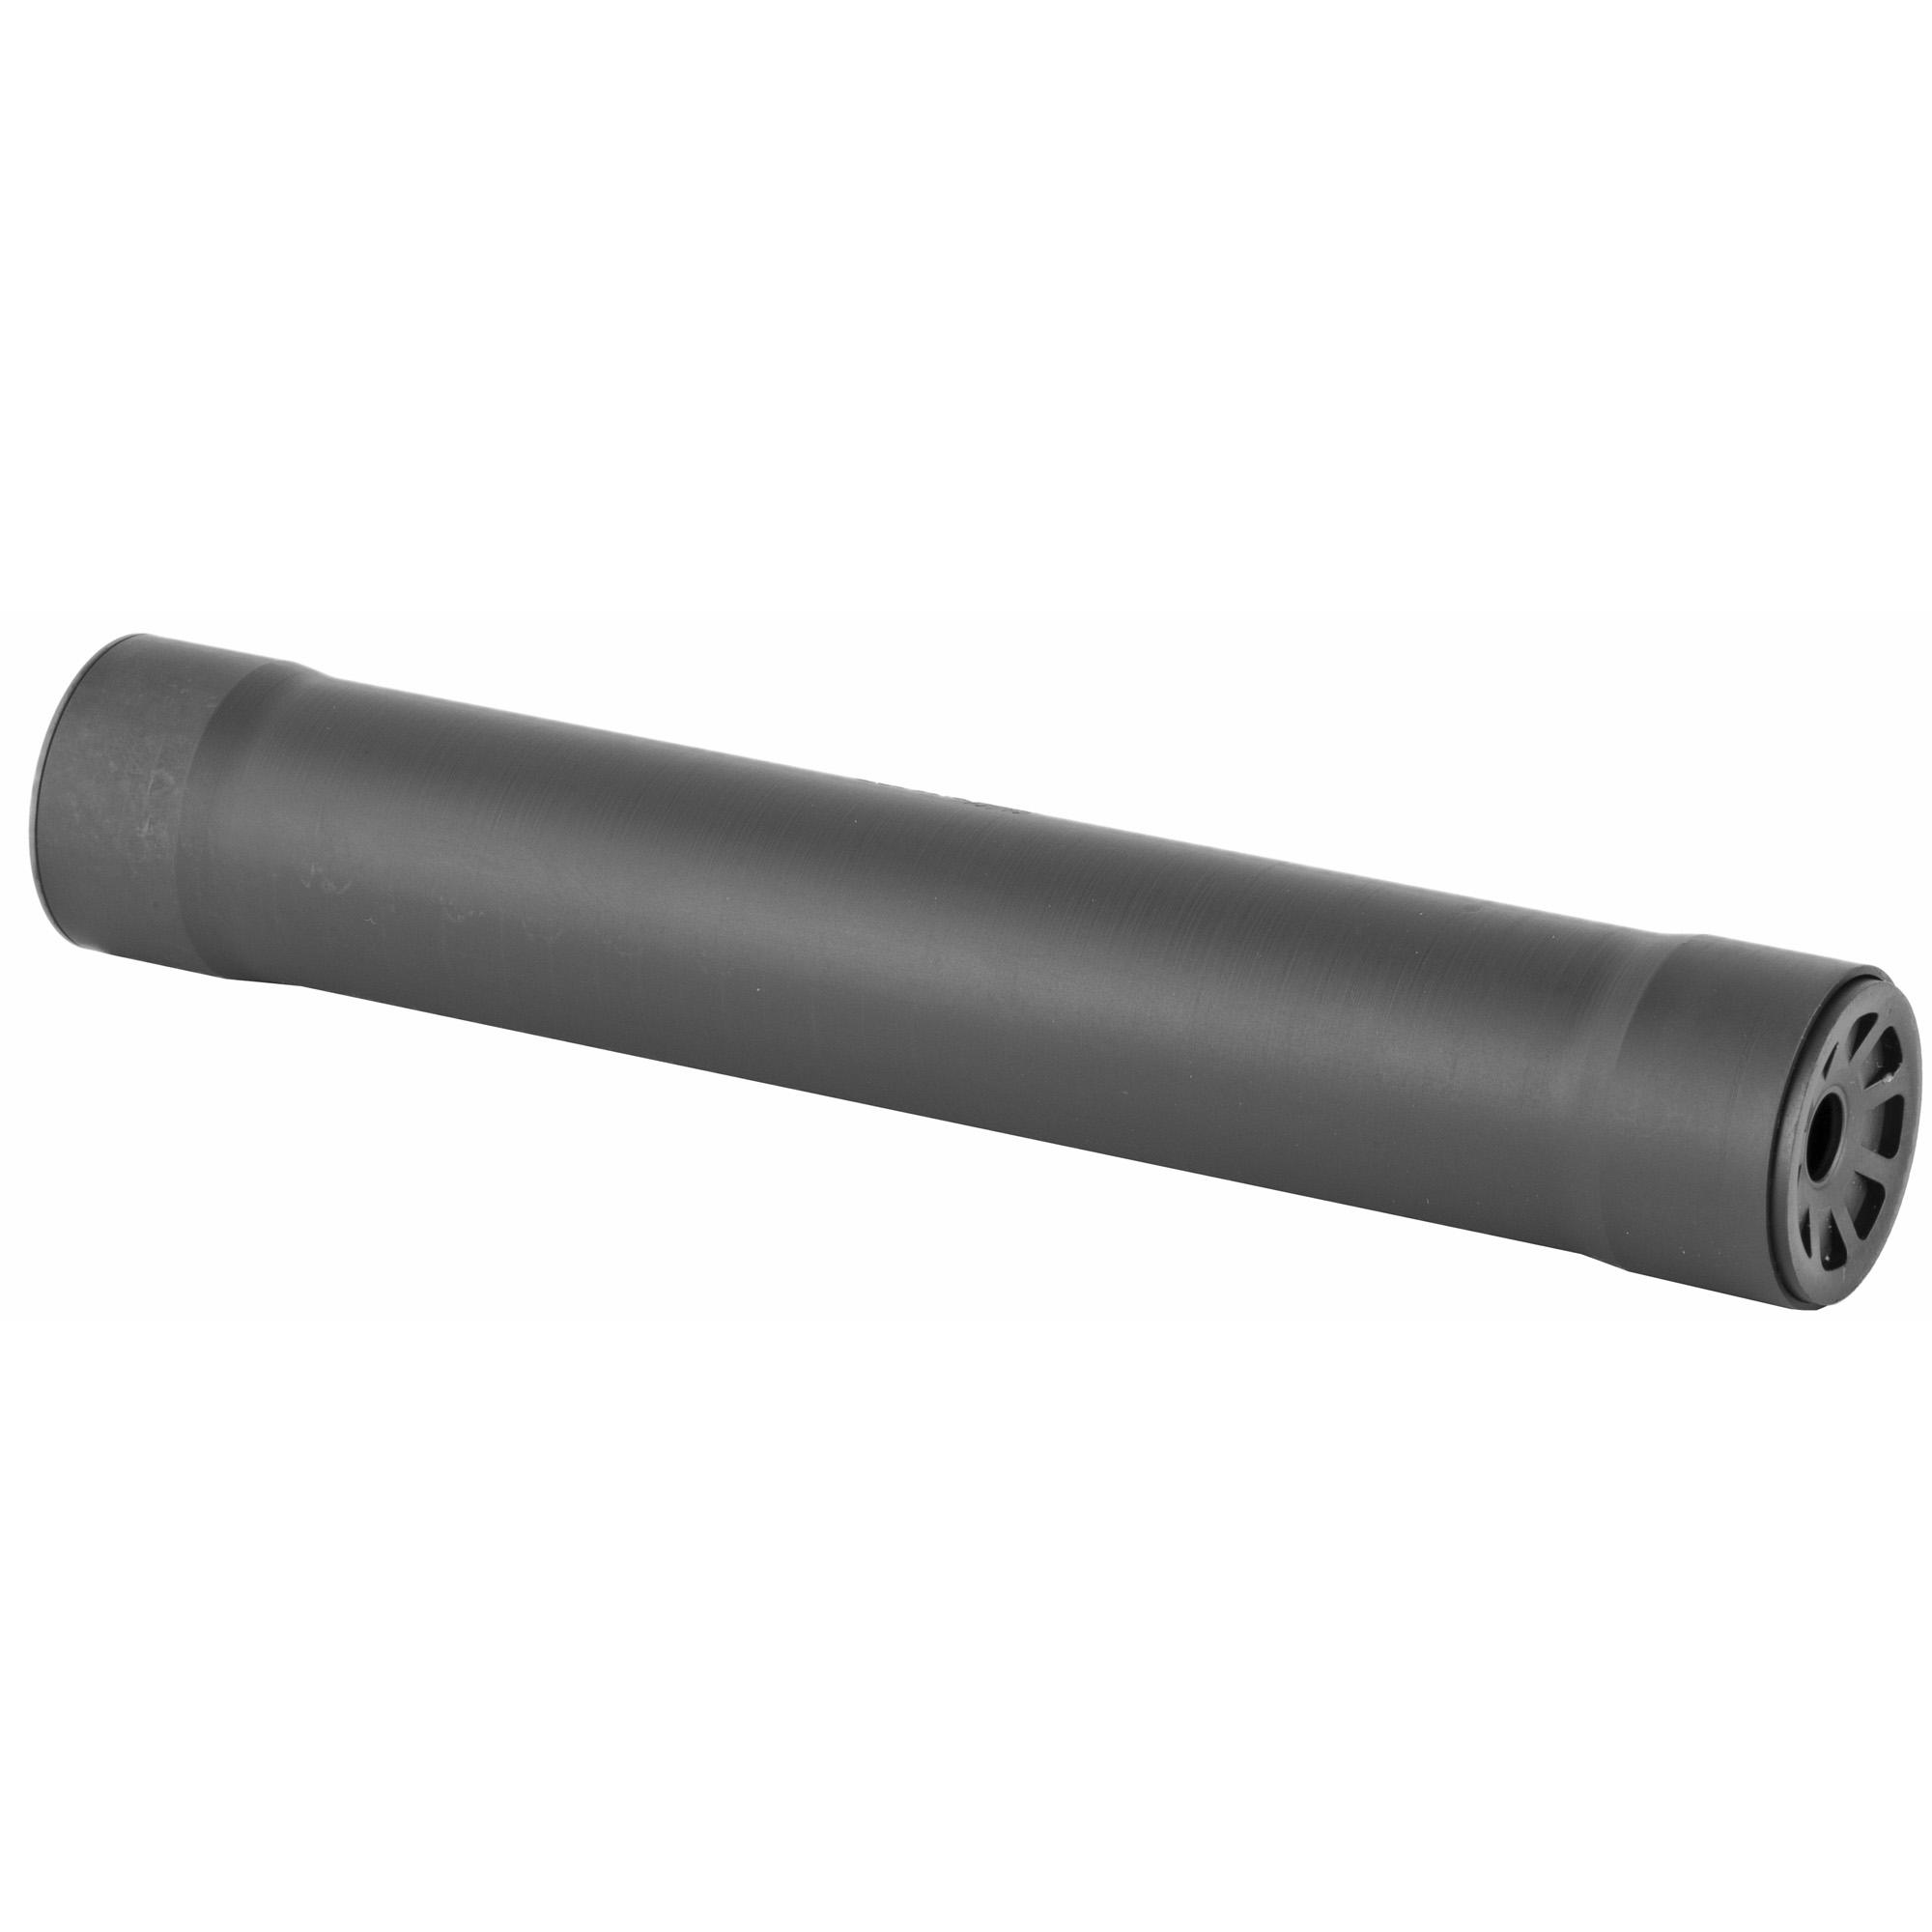 Sig Sauer SDR22X Titanium 22 Silencer (SRD22X)